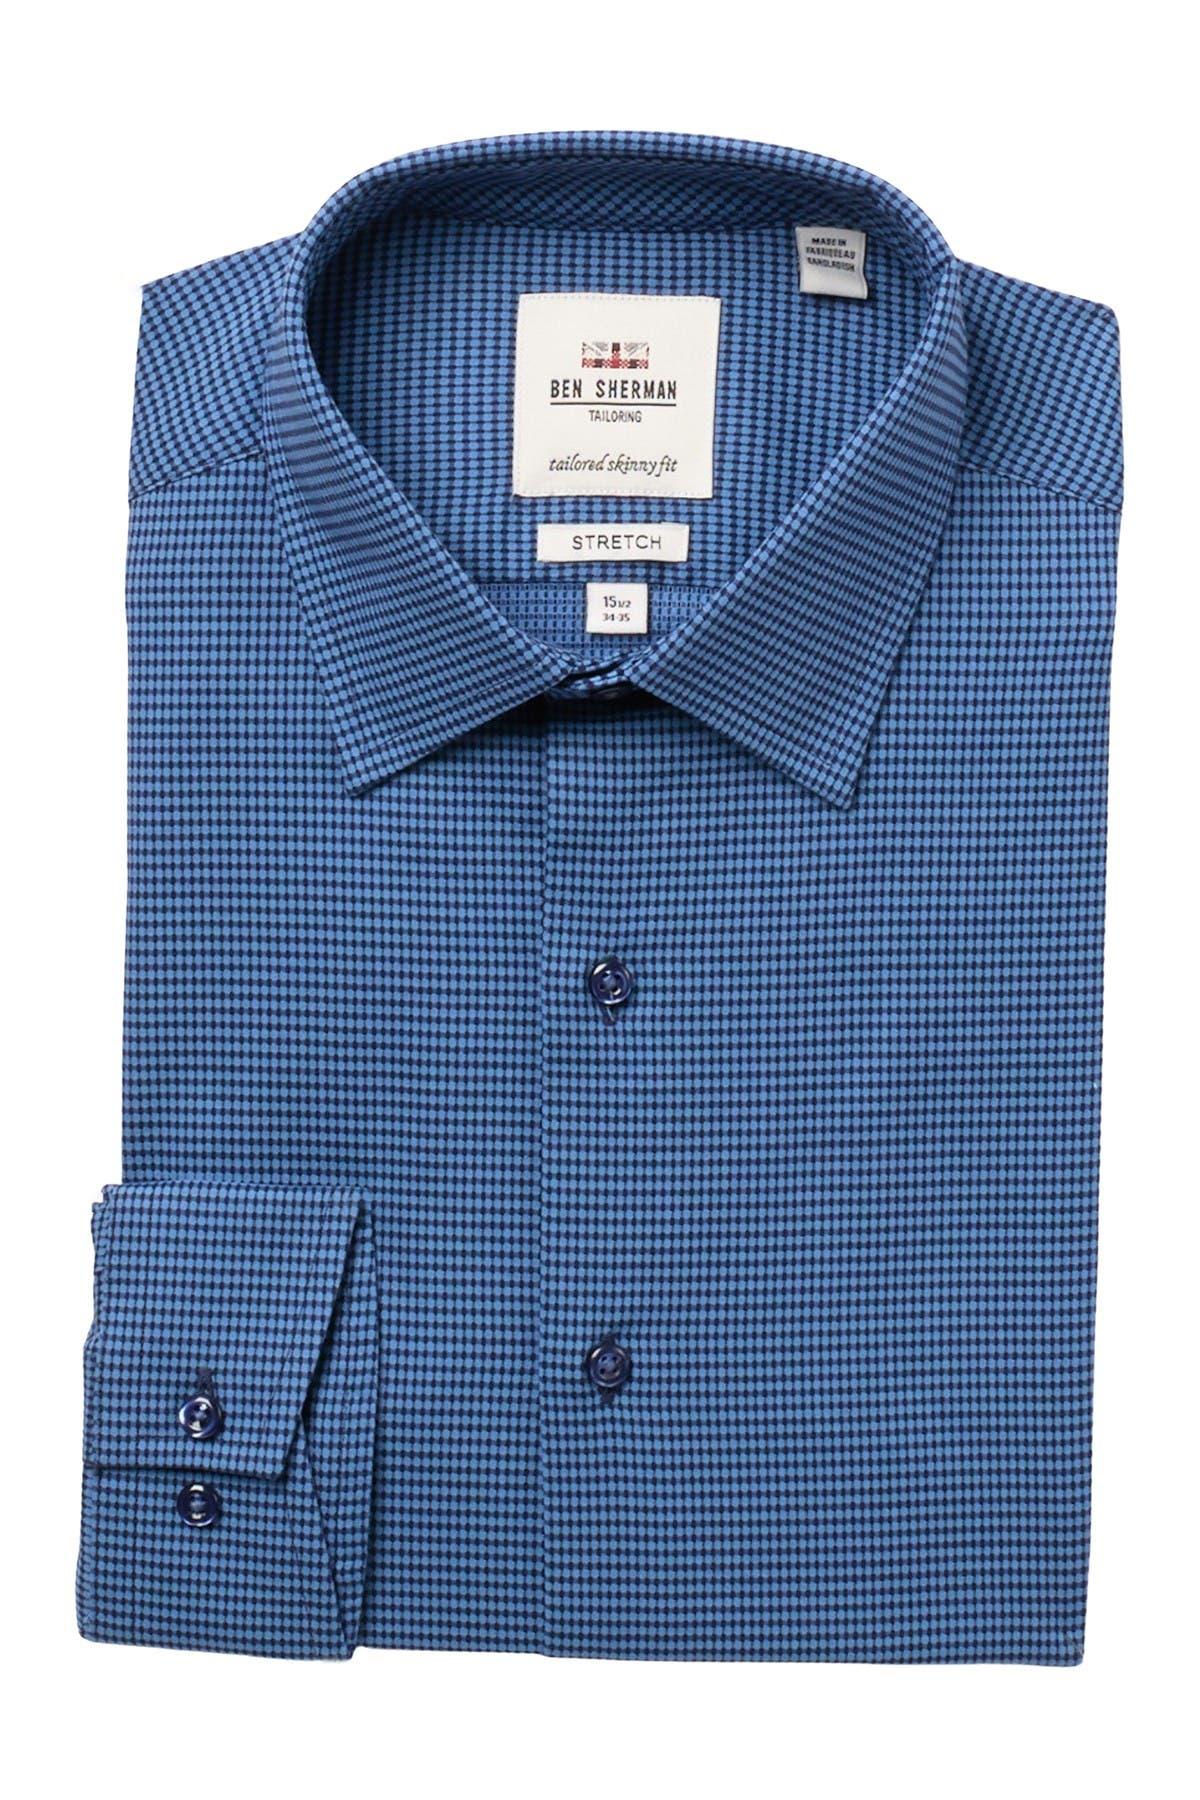 Image of Ben Sherman Micro Print Tailored Skinny Fit Dress Shirt